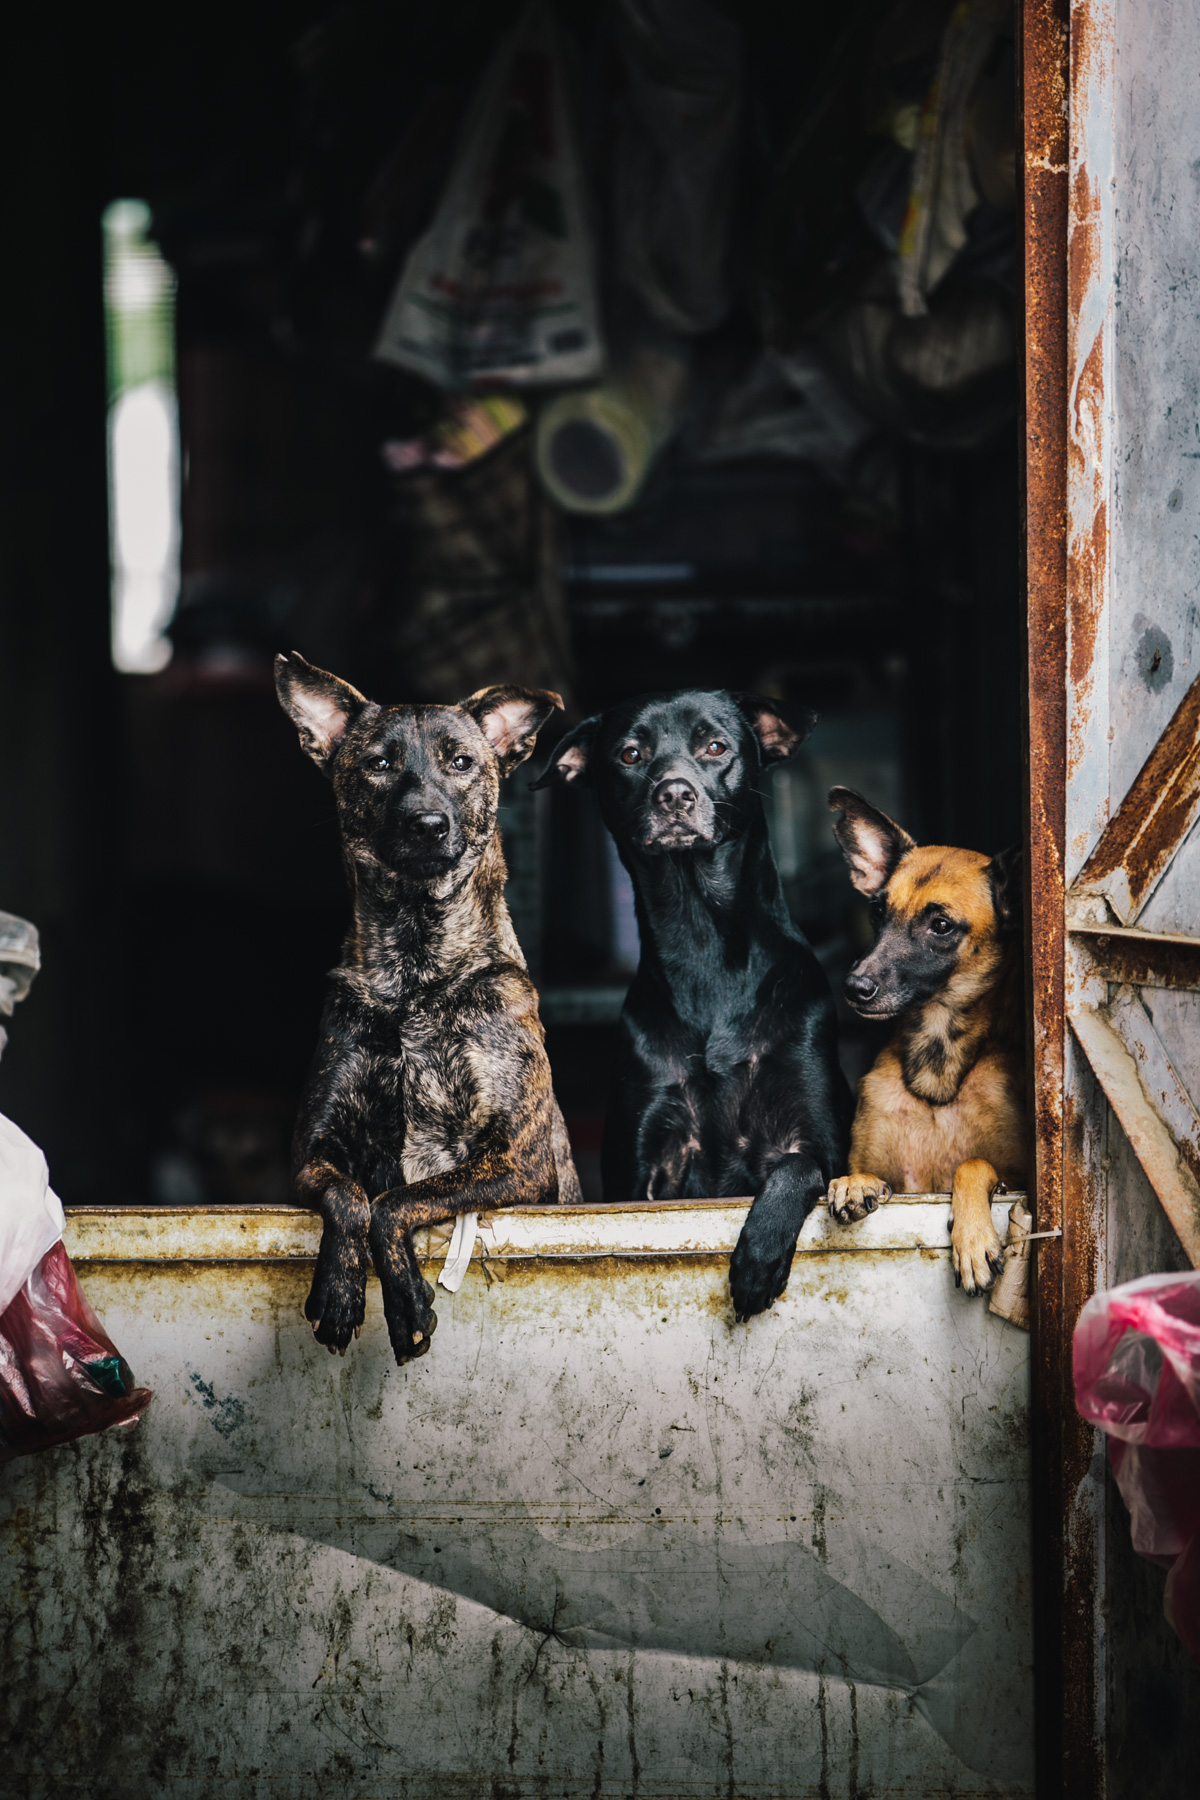 Kalen Sheng Fu_A Sheltered Life_Untitled 02.jpg